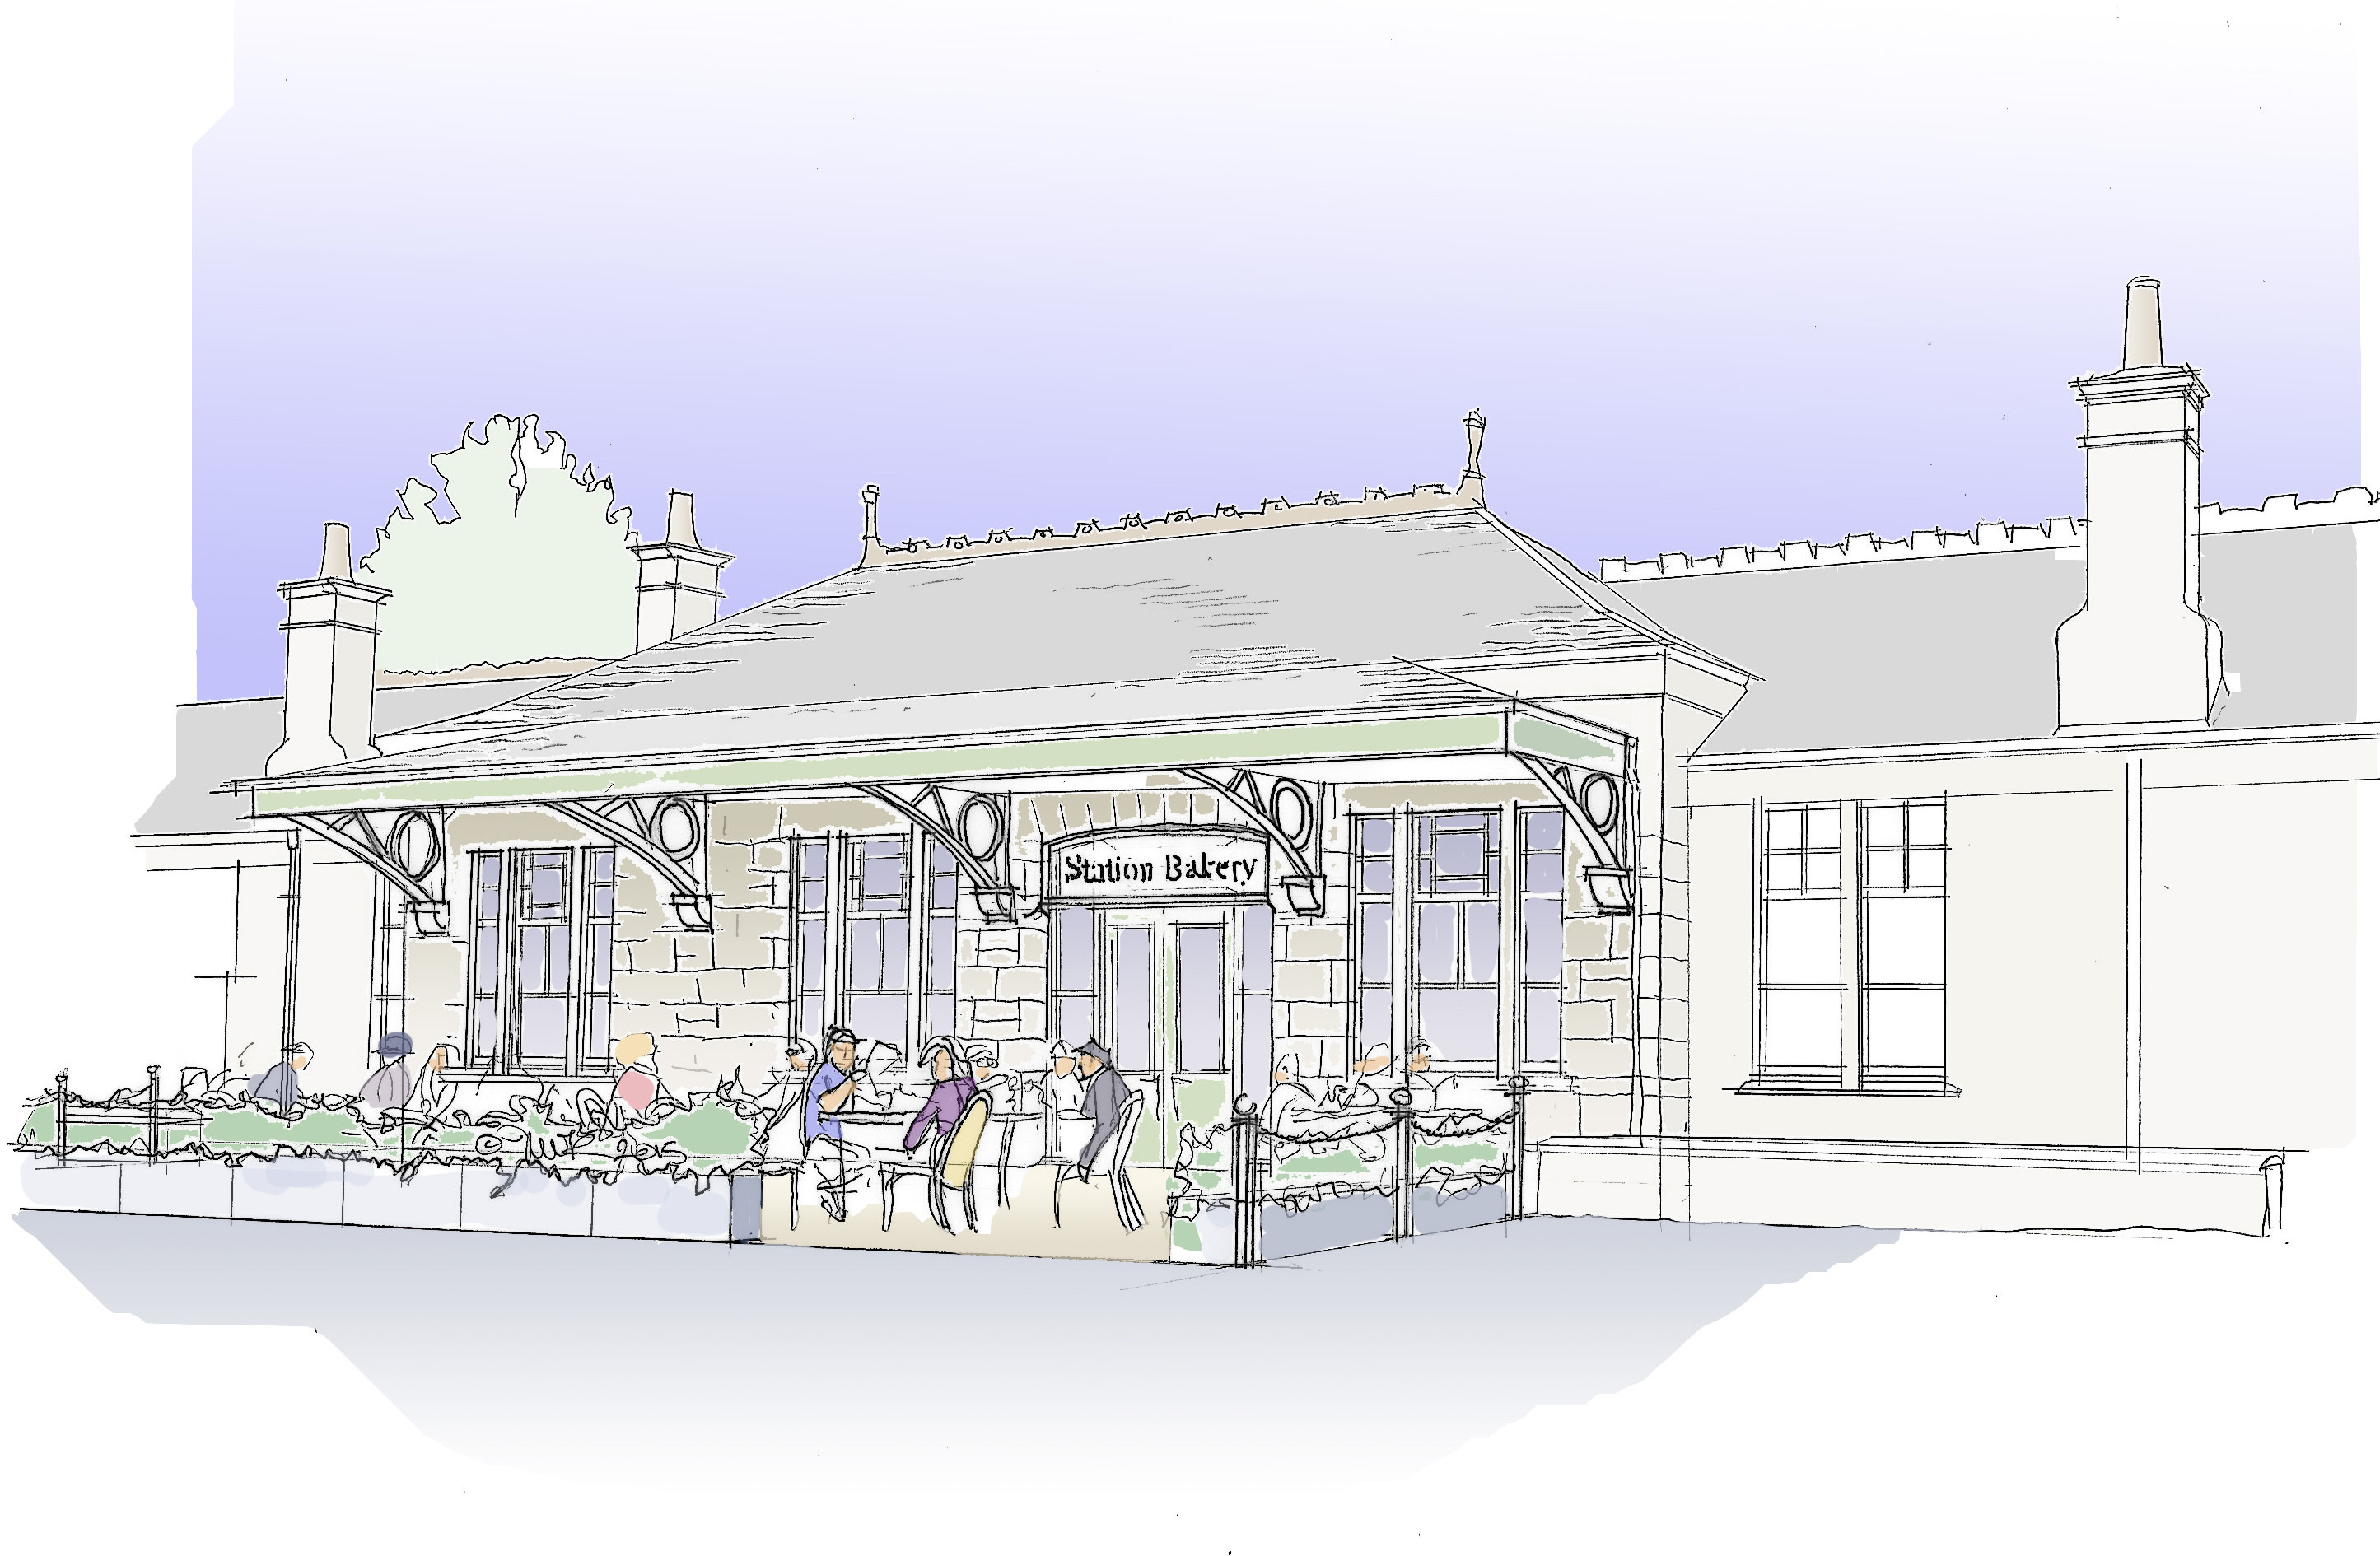 Artist's impression of Aboyne Station